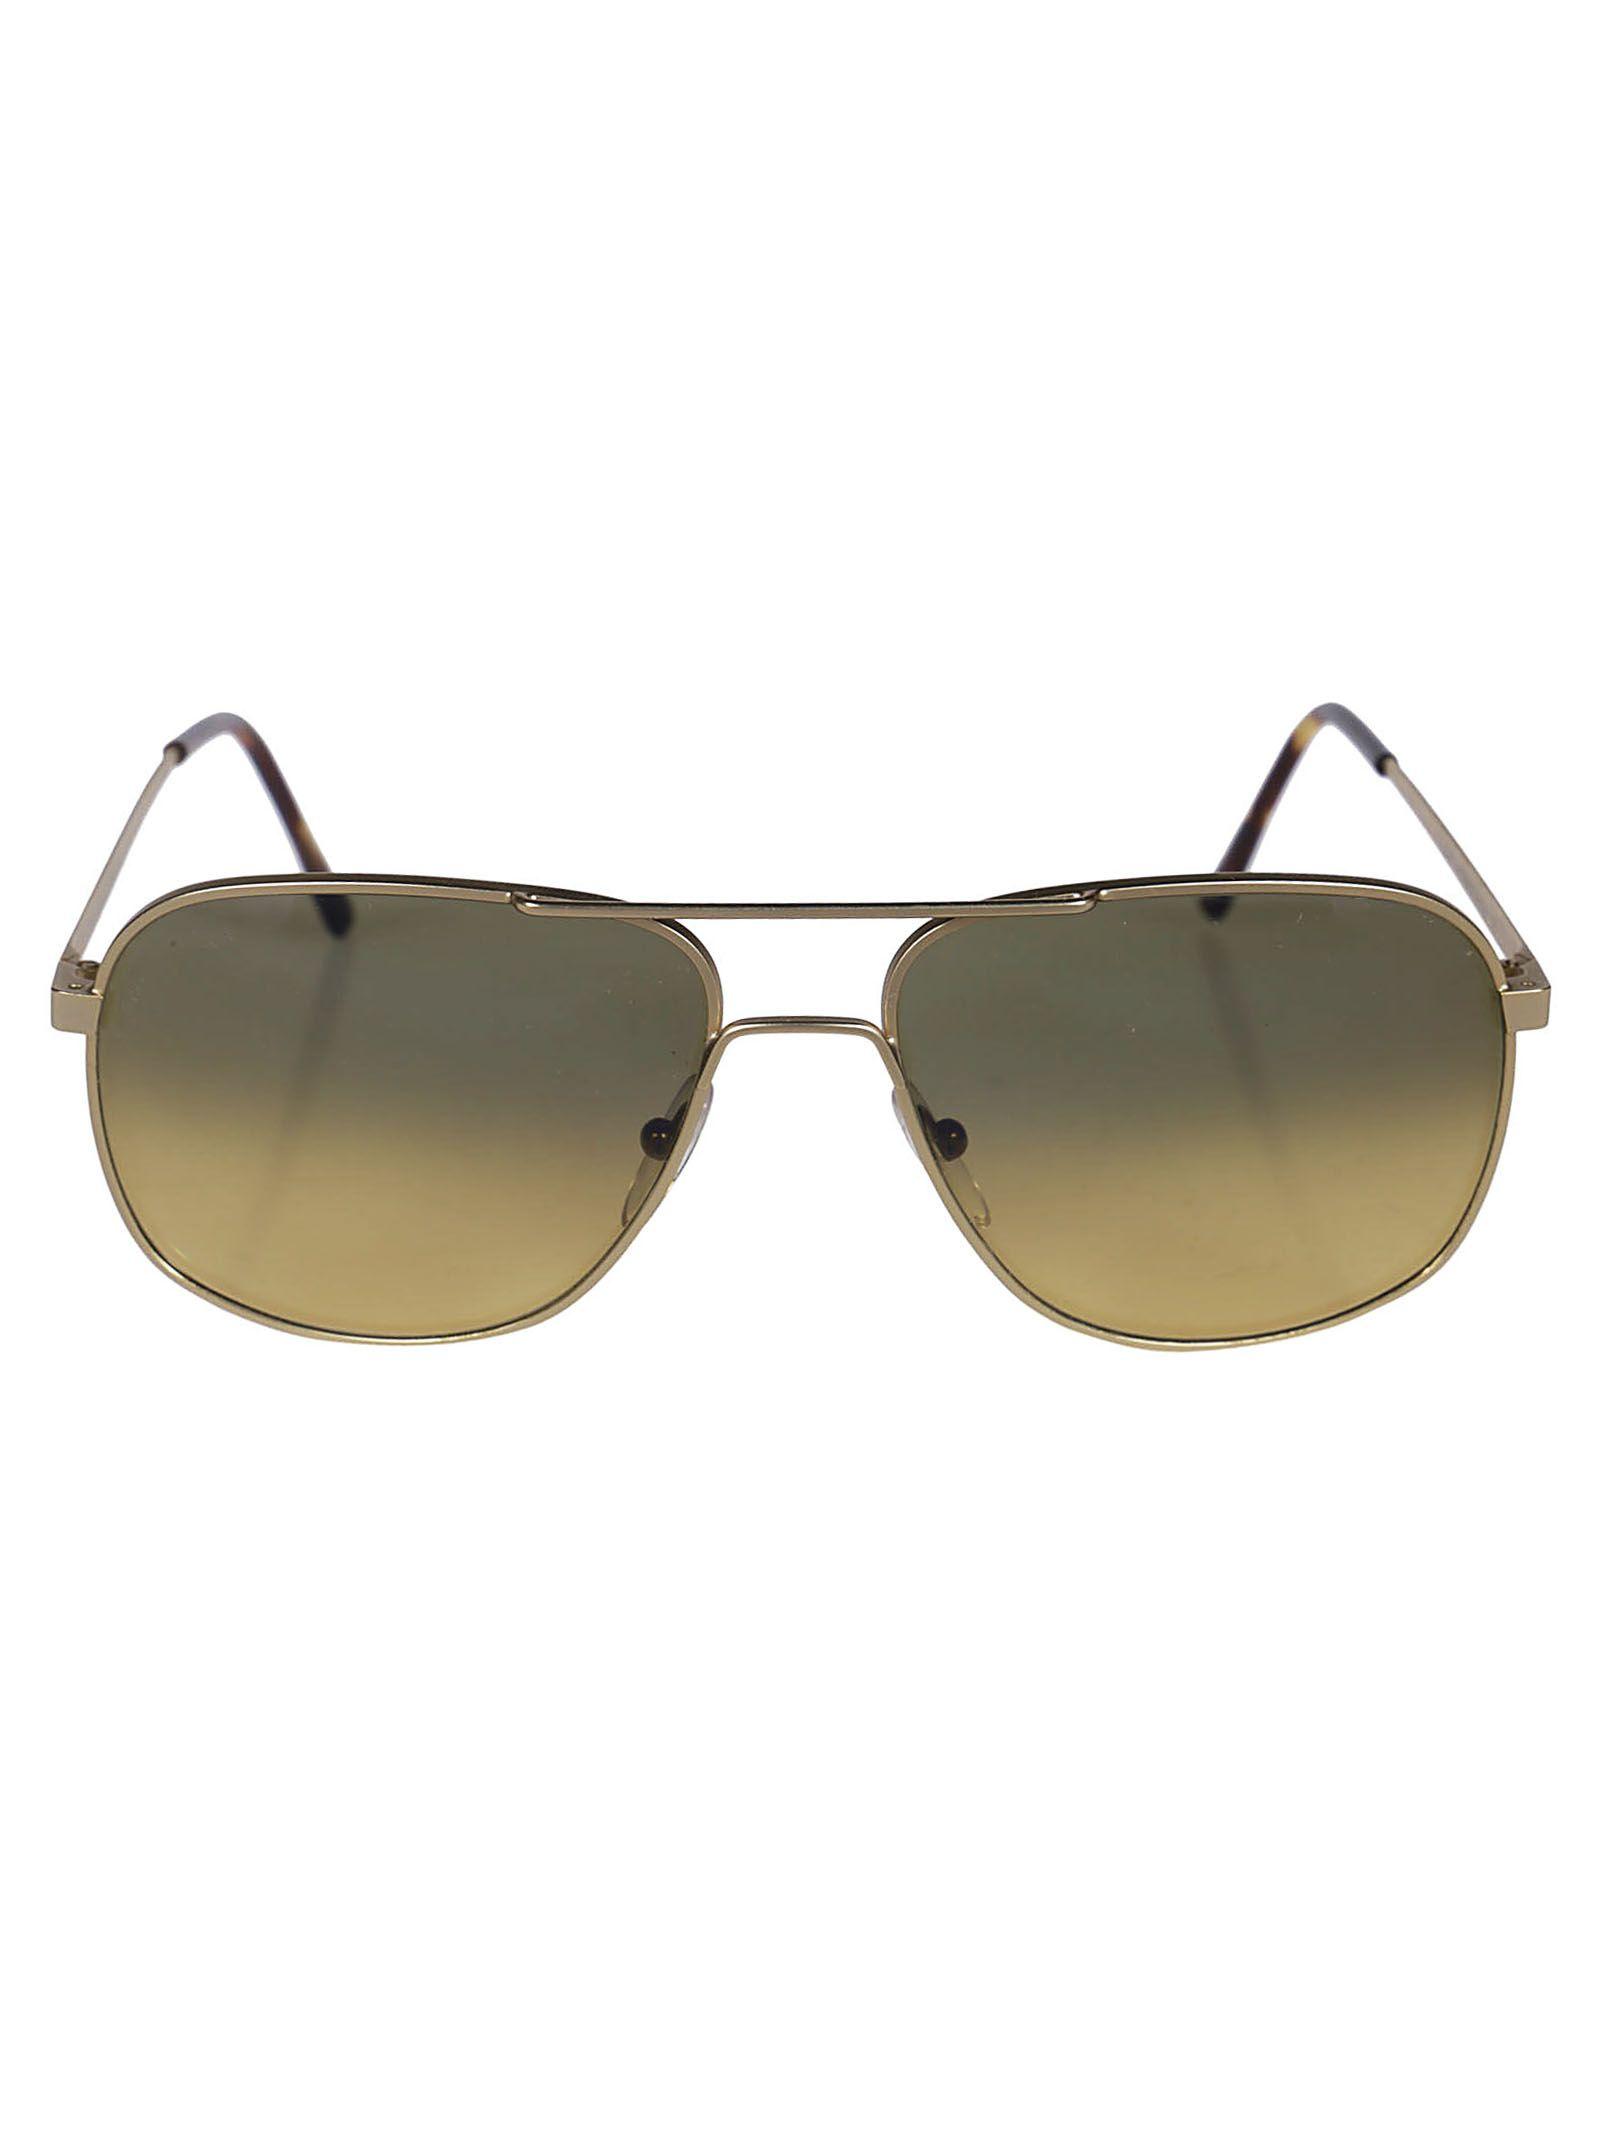 L.G.R Lgr Rift Sunglasses in Gold Matt